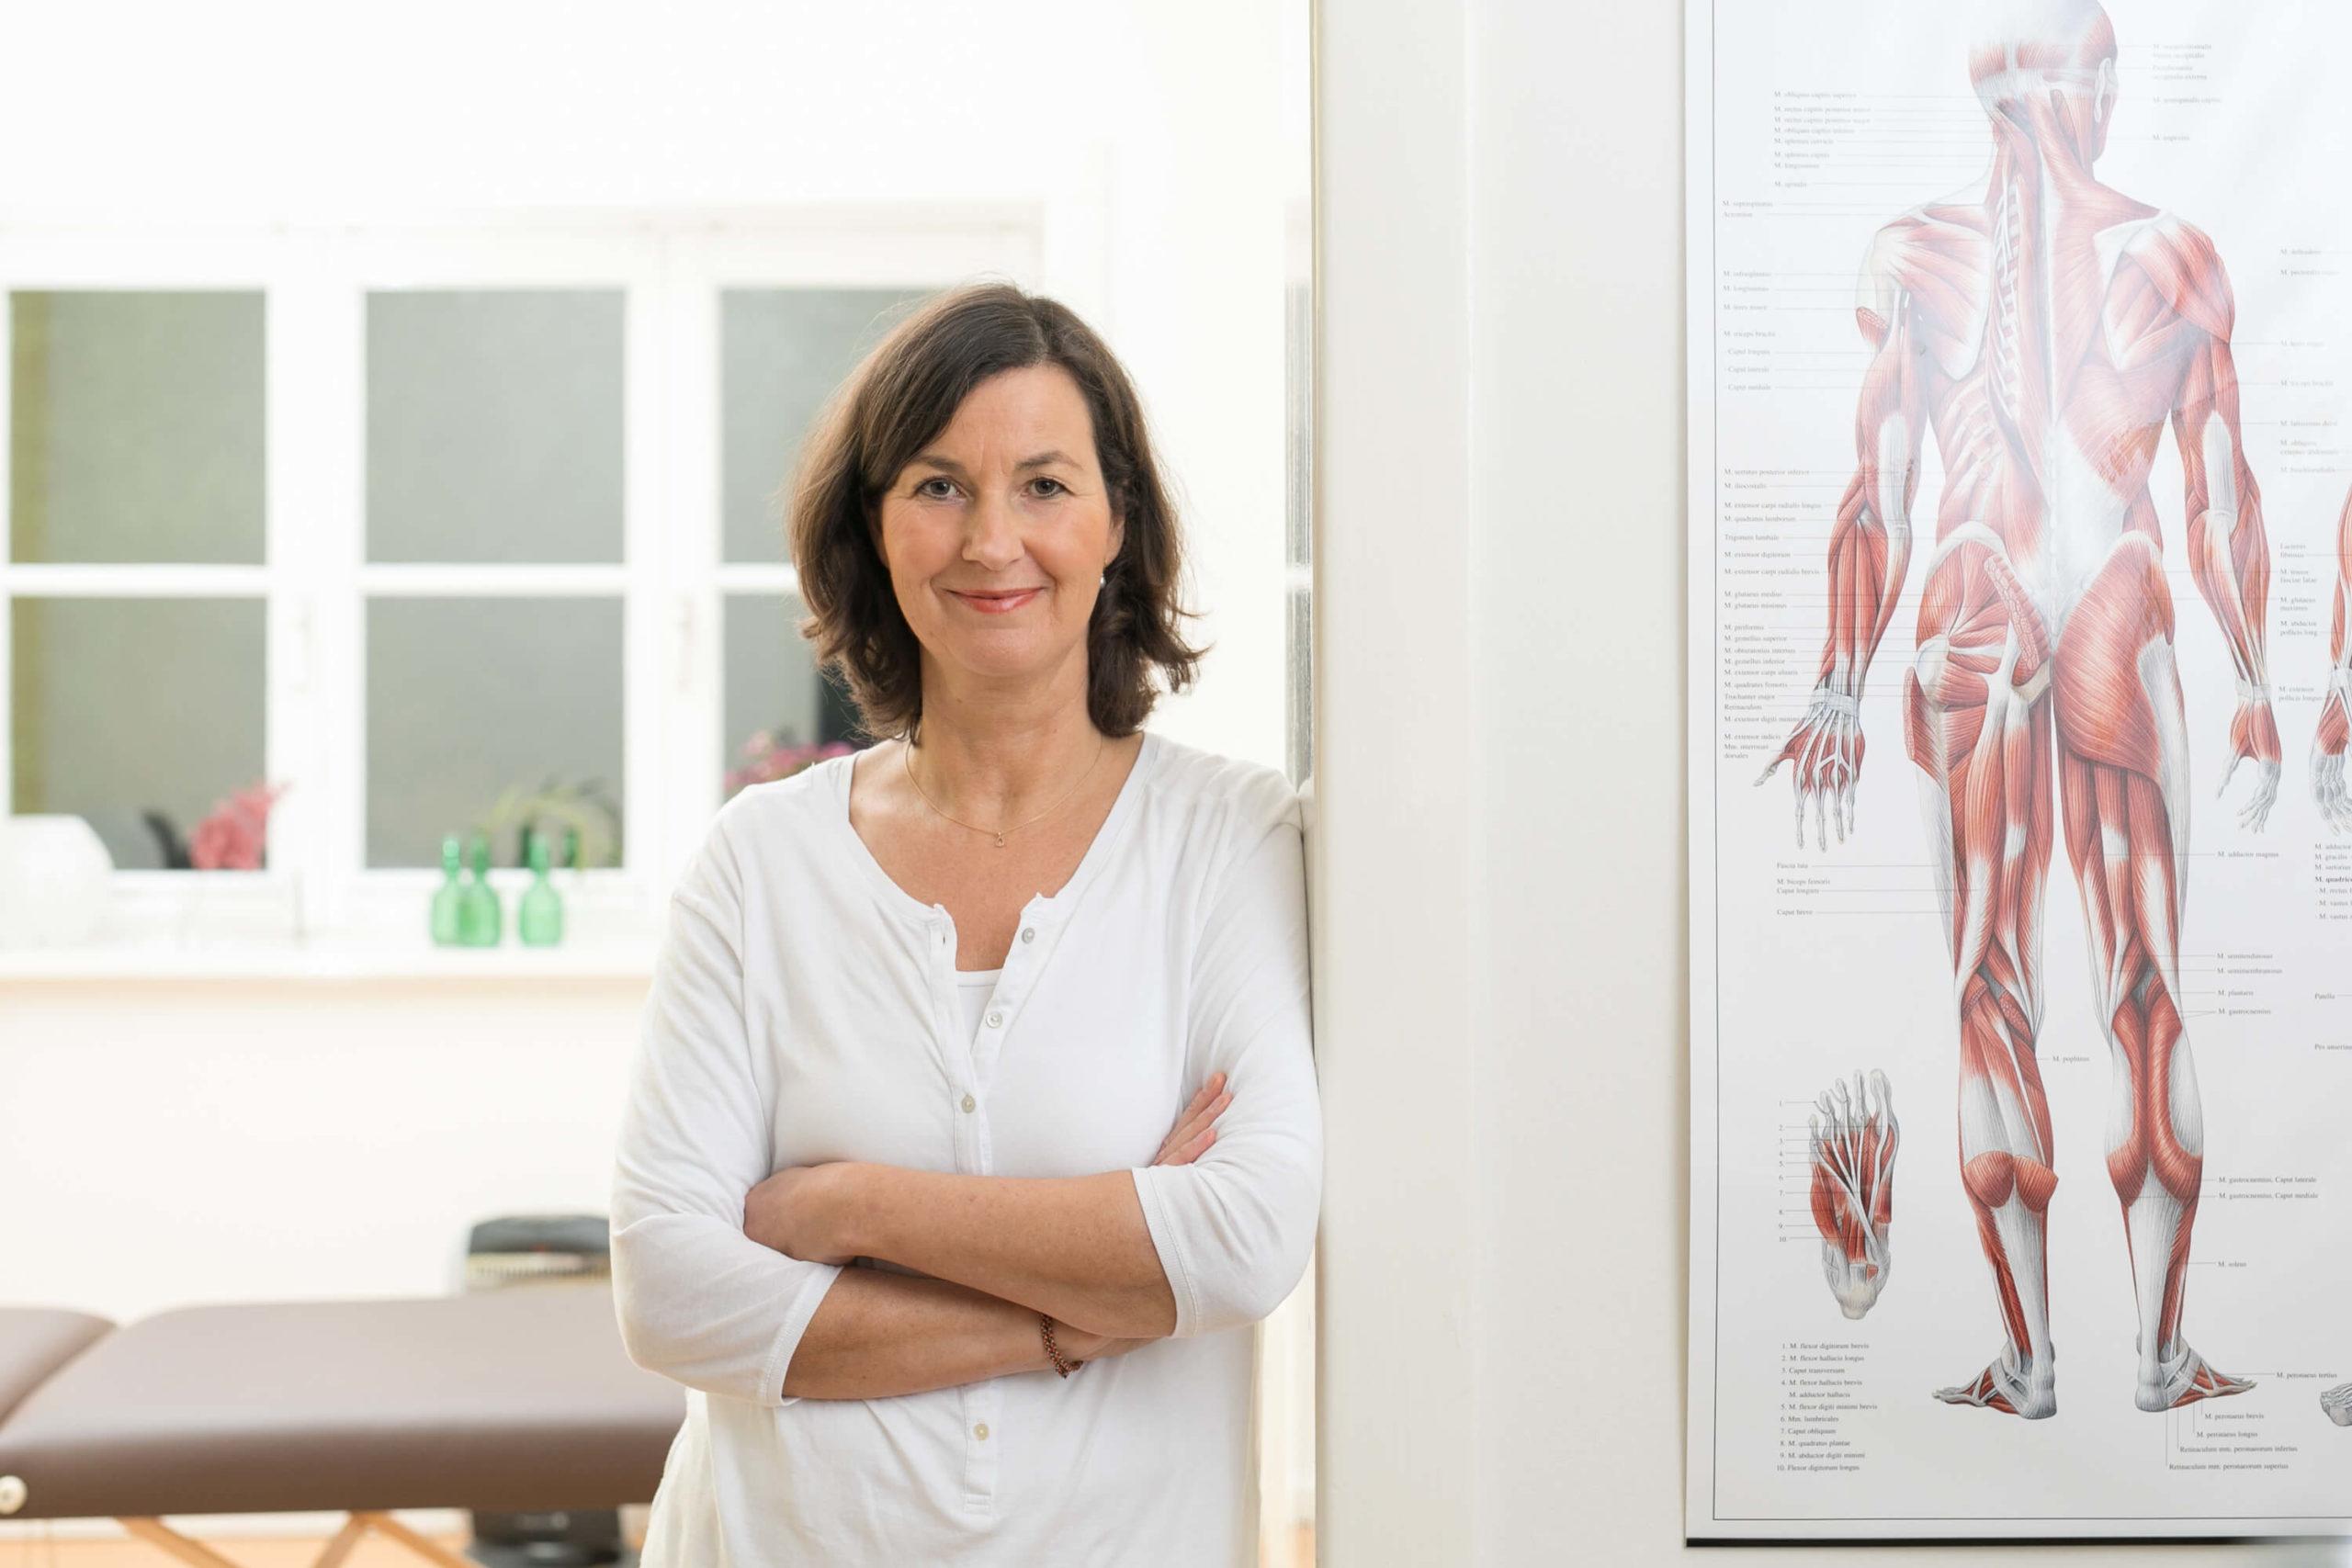 Naturheilpraktikerin Kristina Wagner